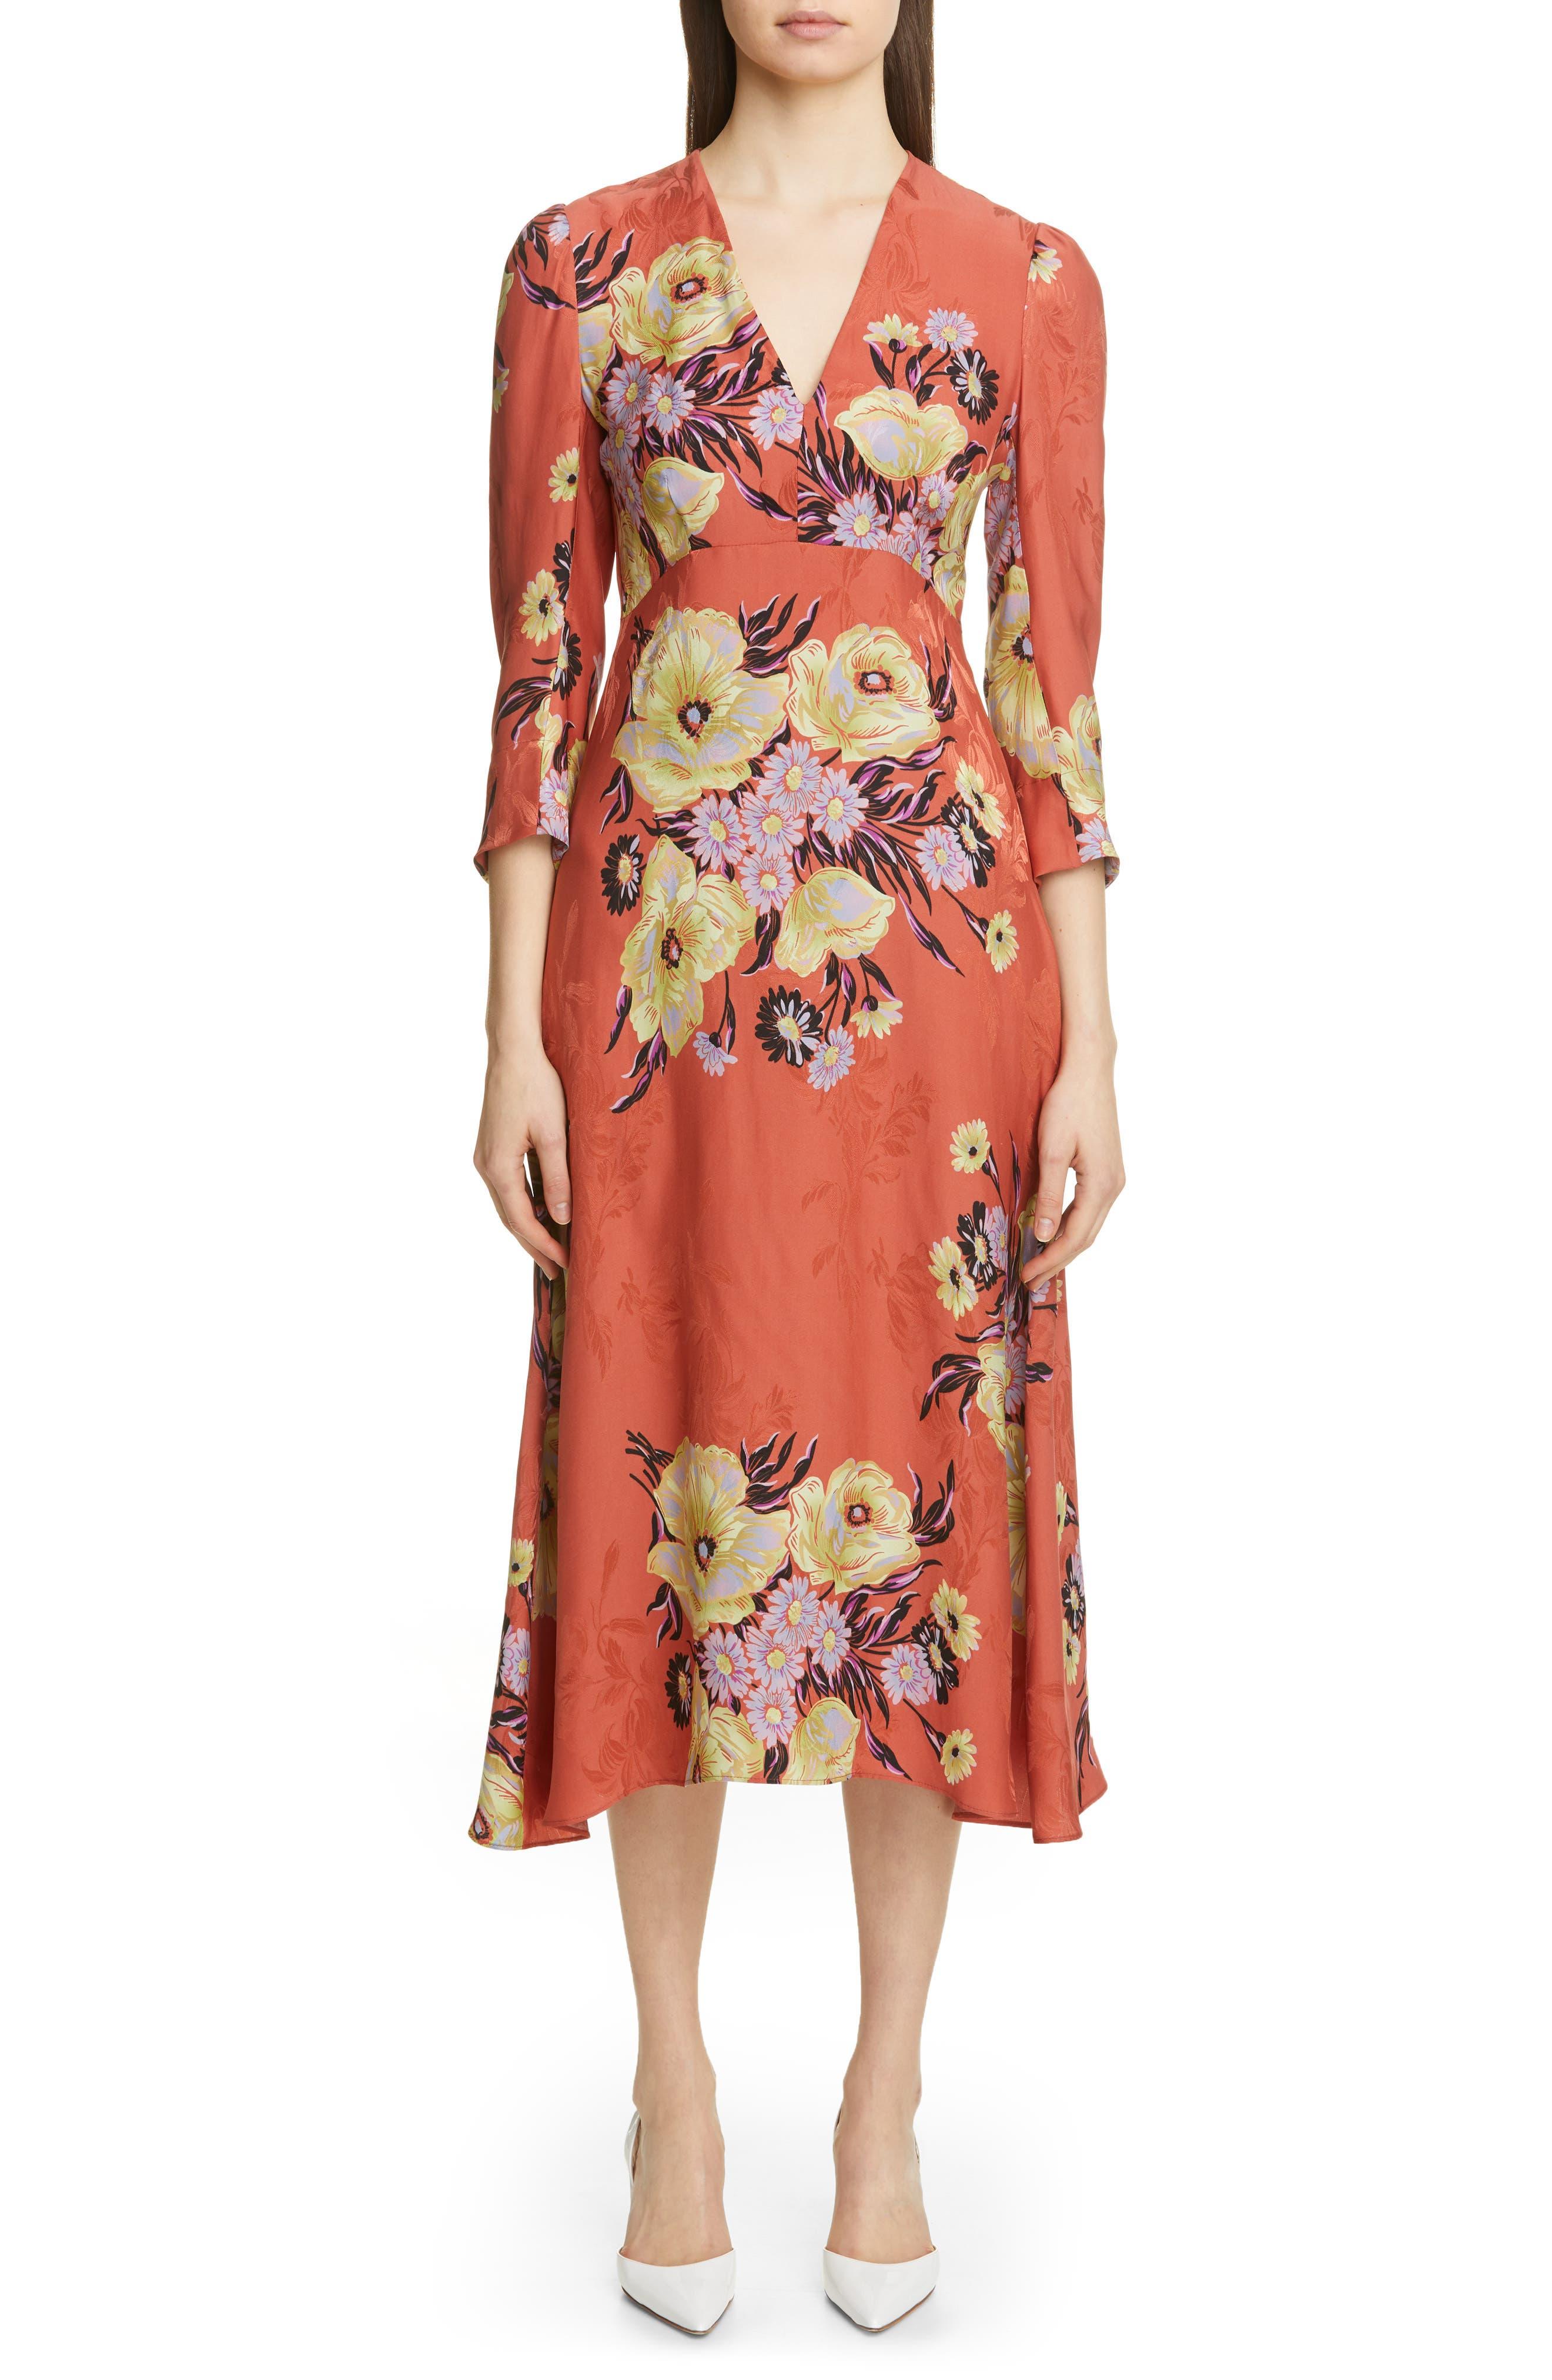 Etro Floral Jacquard A-Line Midi Dress, US / 48 IT - Orange